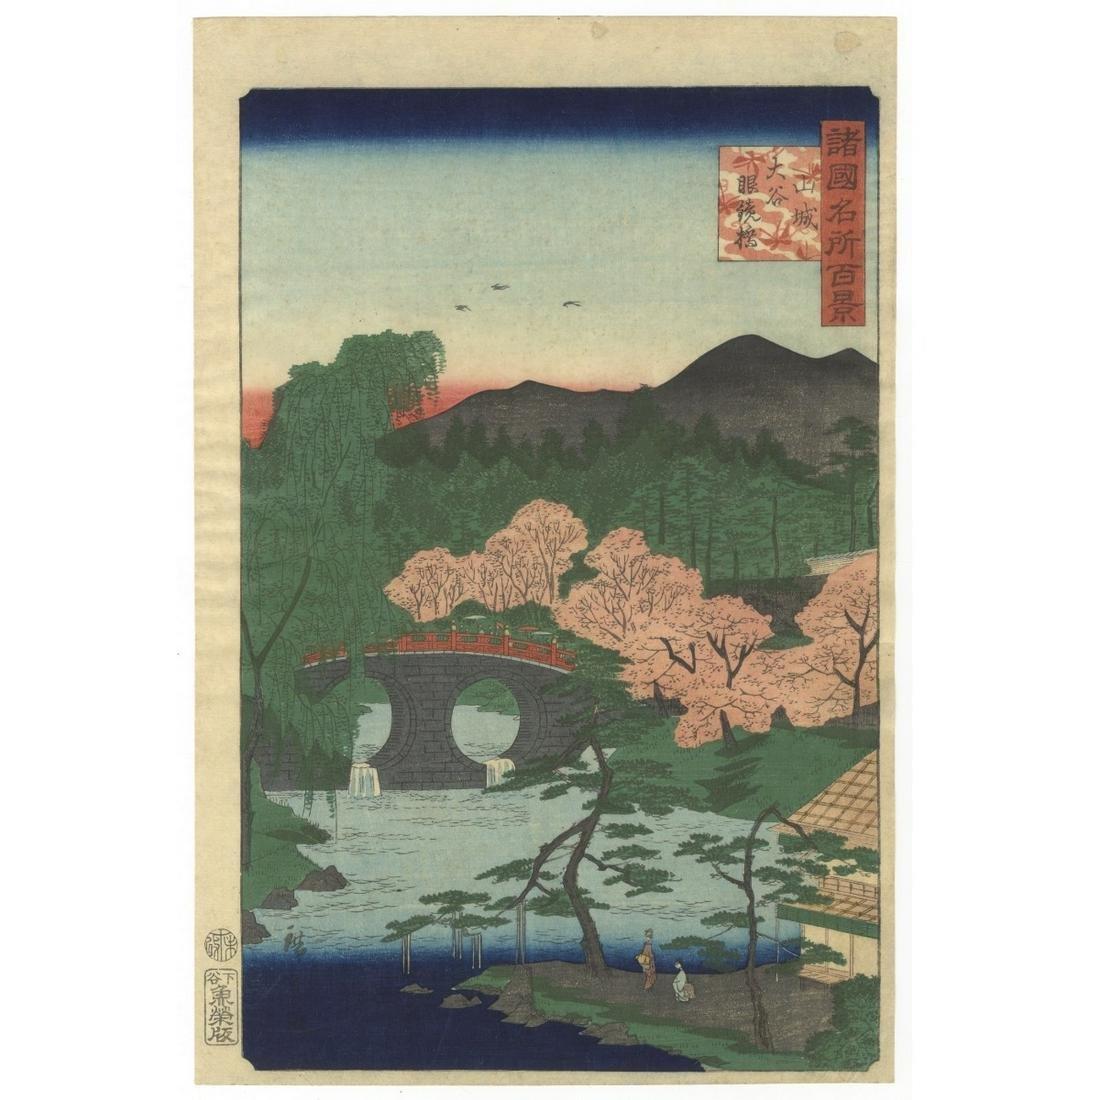 Title: Hiroshige II, Otani Bridge, One Hundred Famous